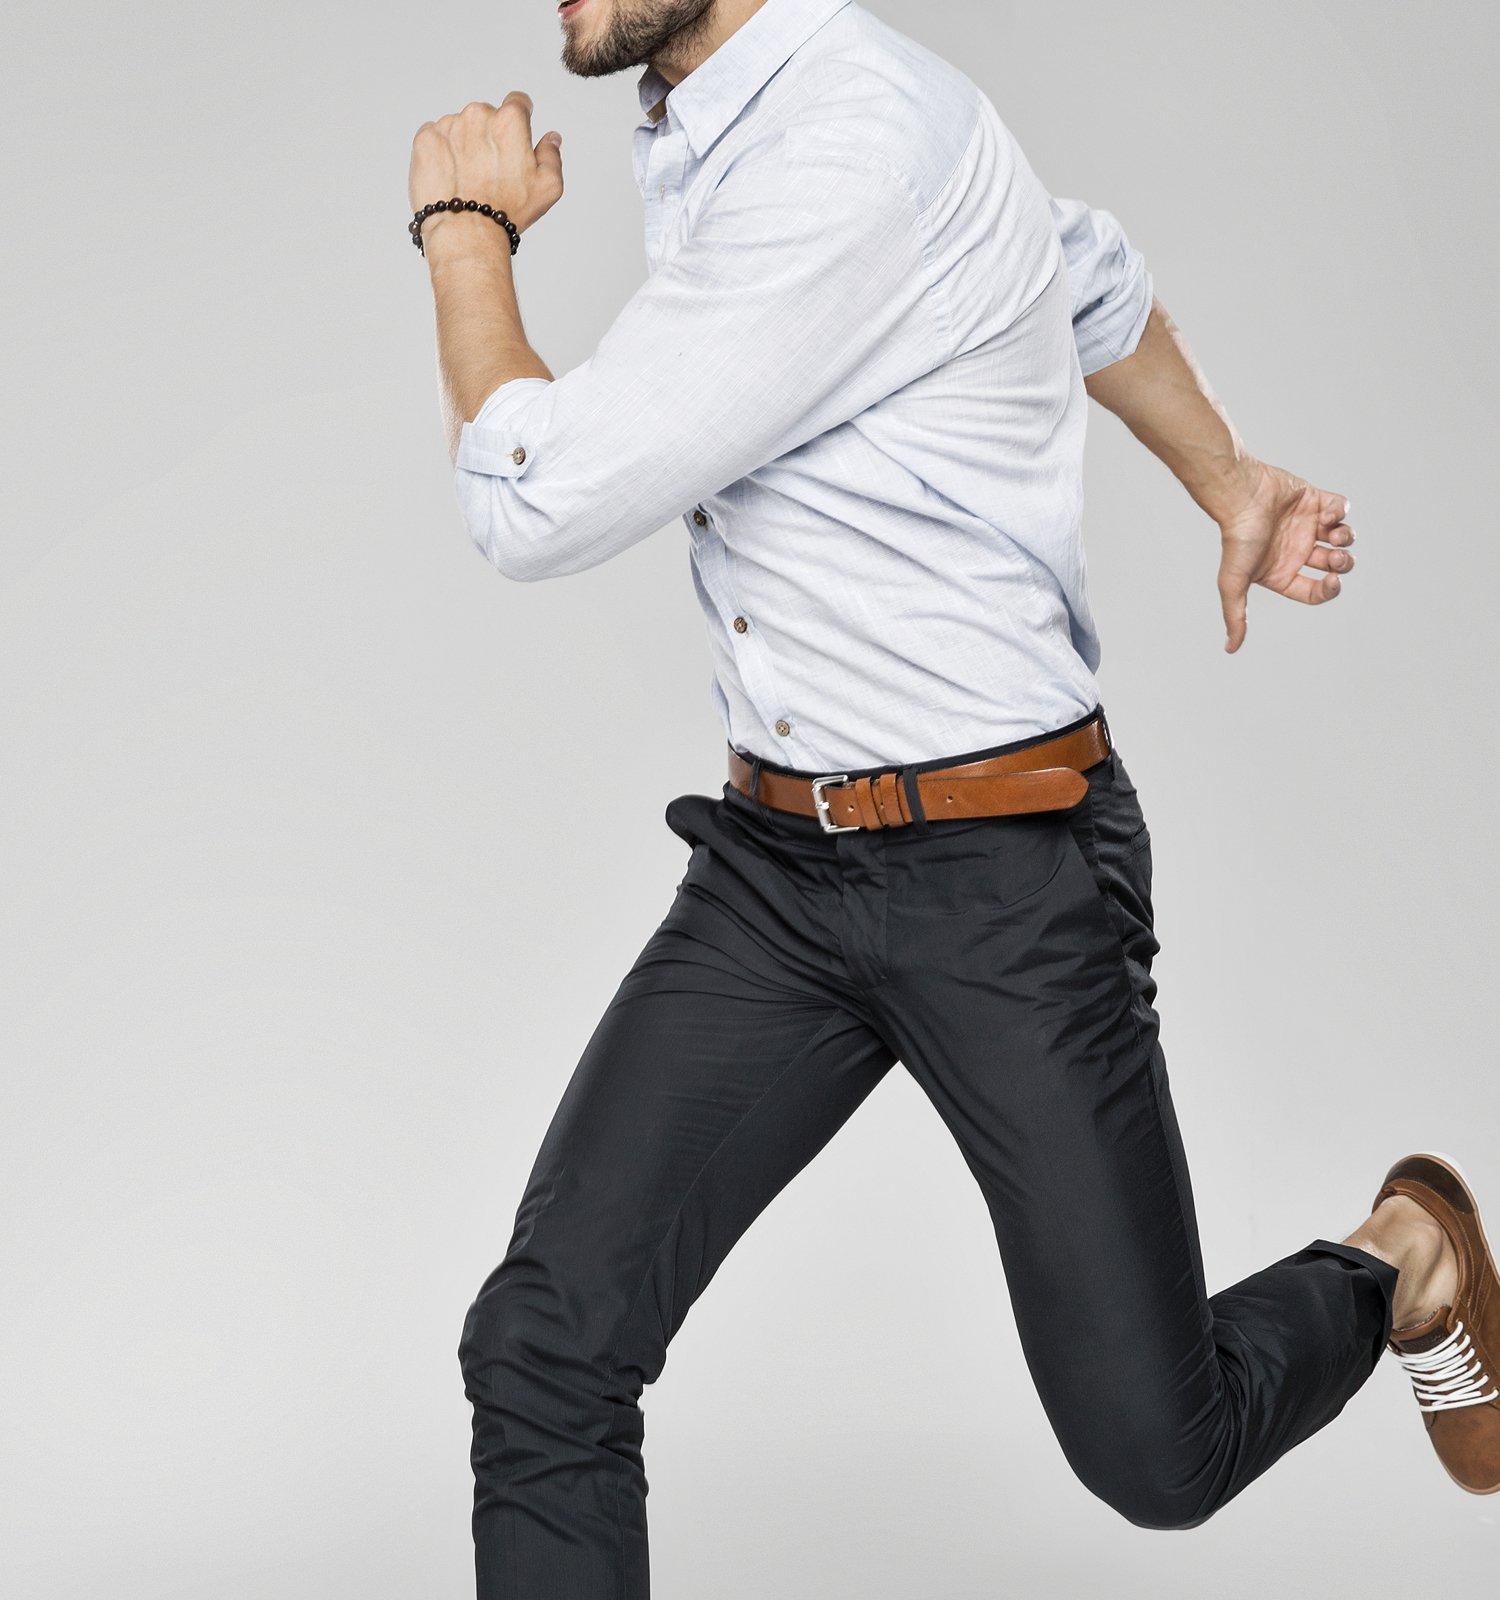 male model jumping posing